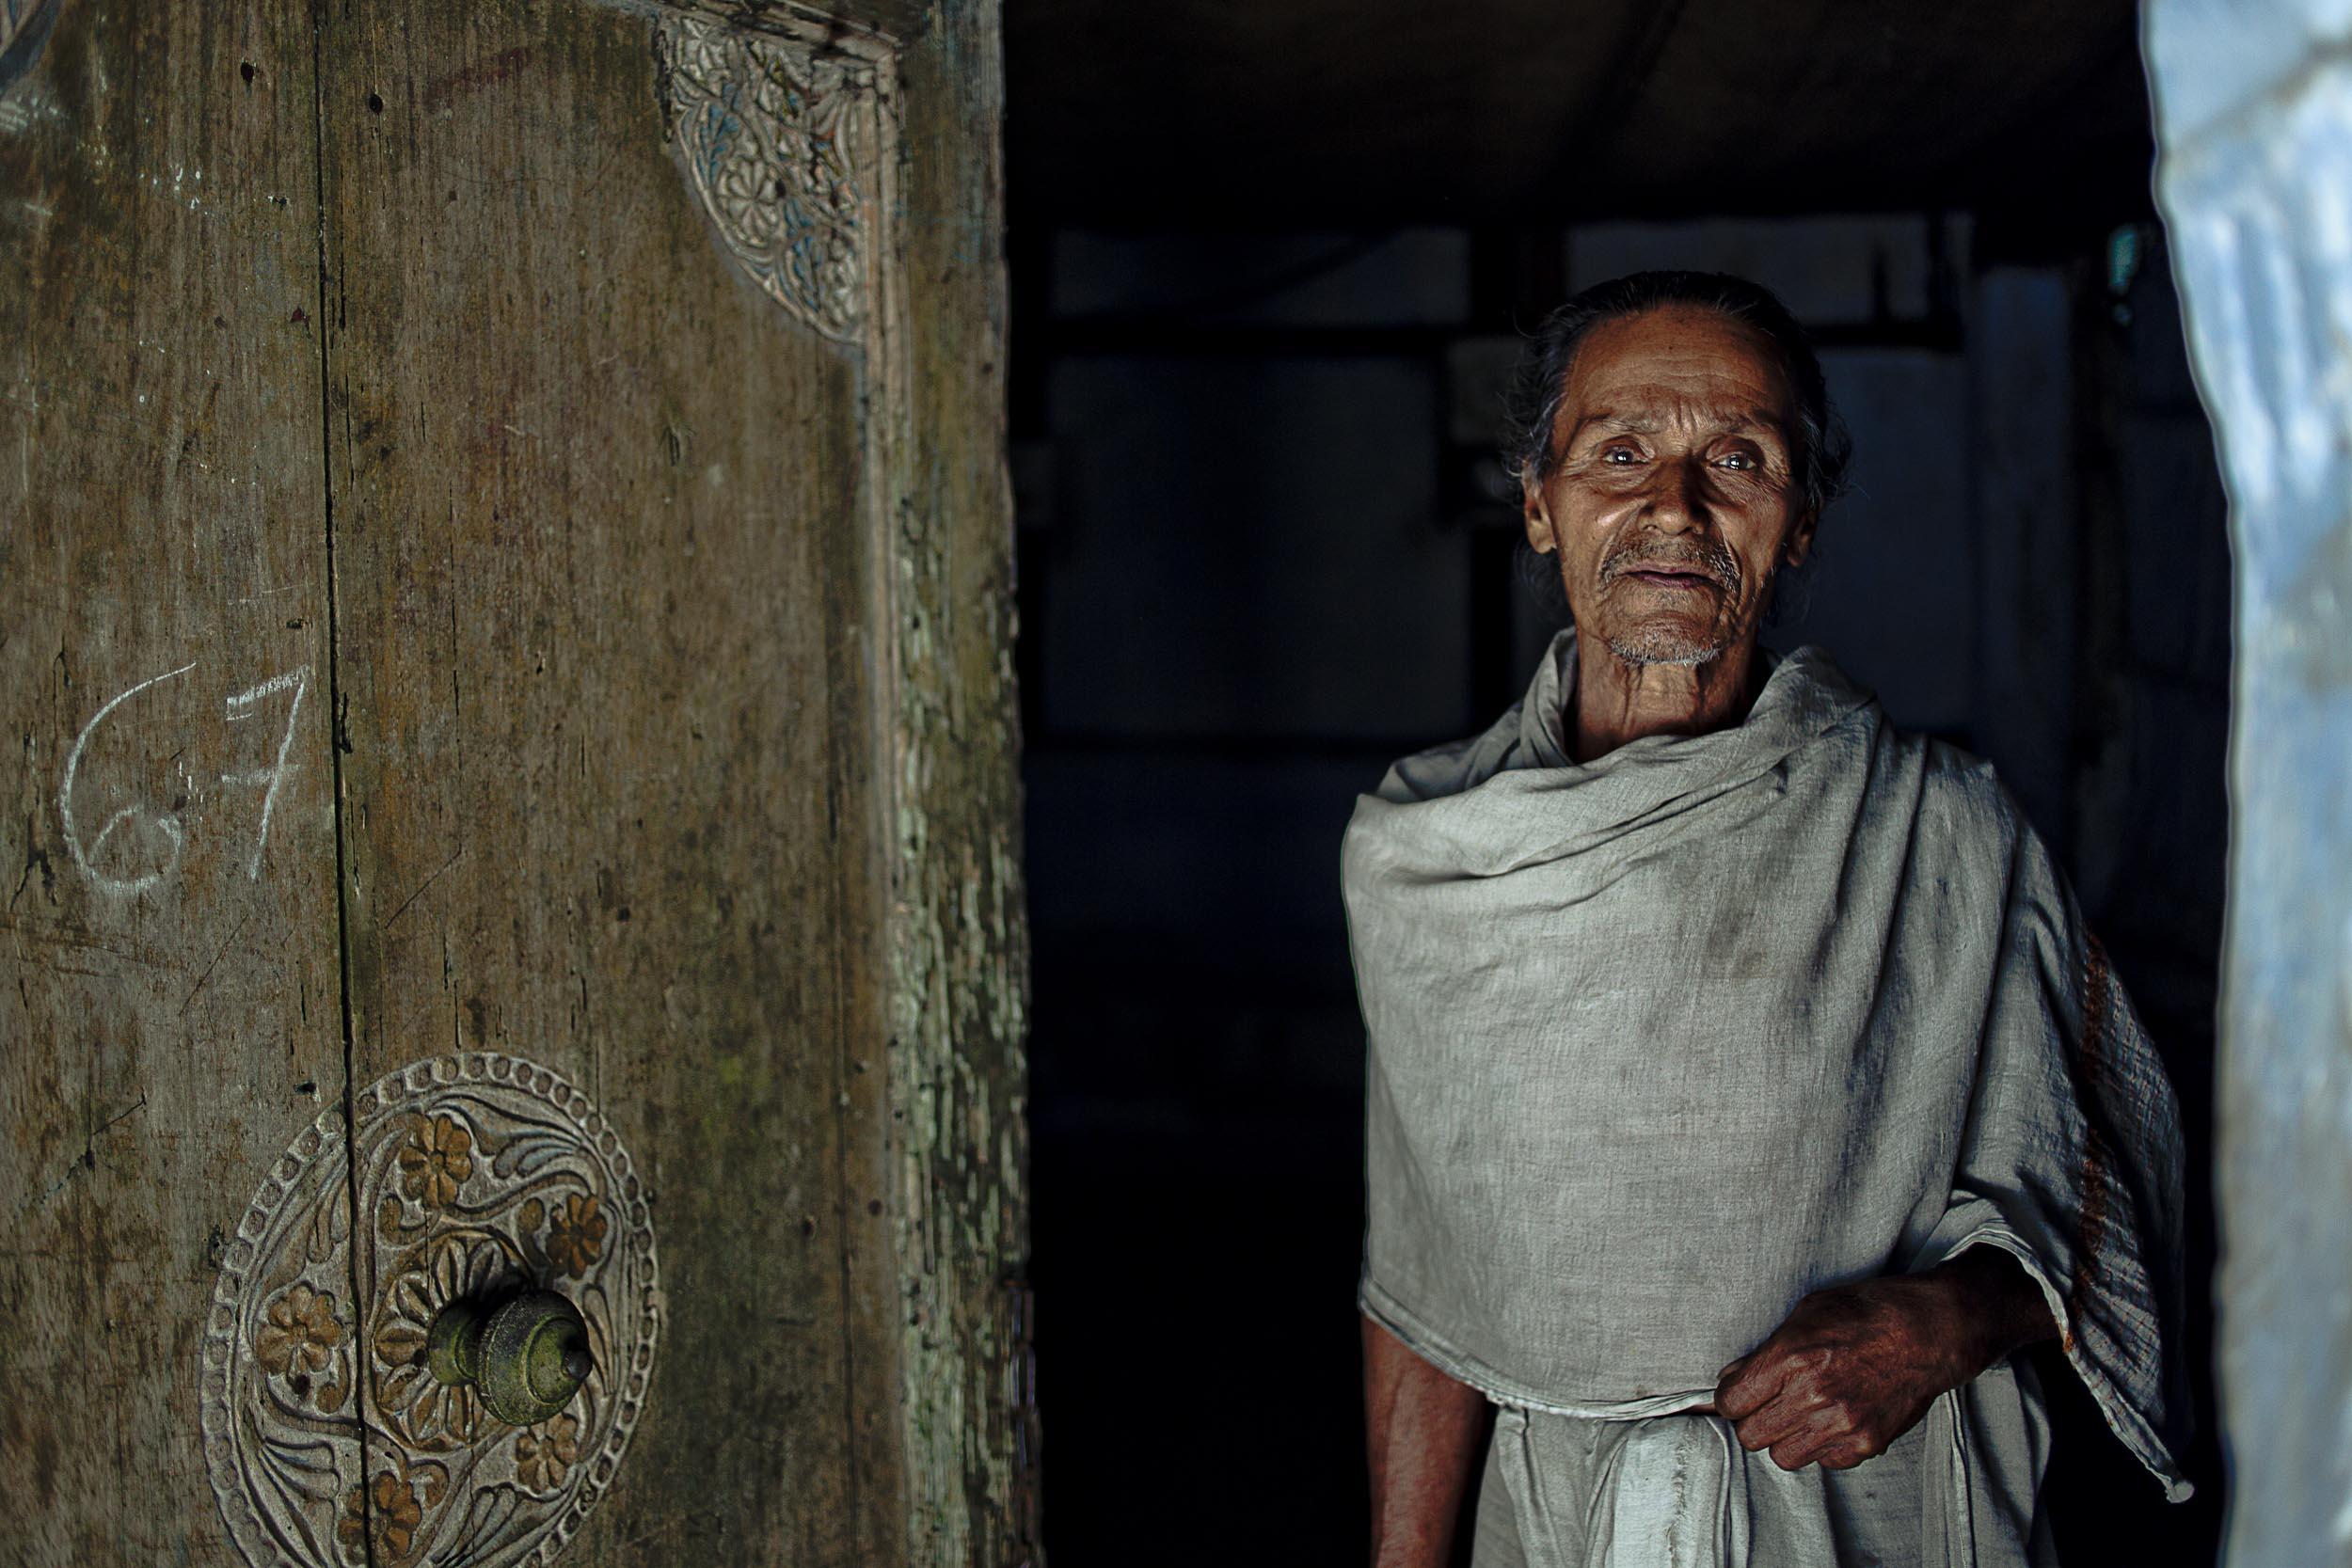 Sindhur_Photography_Travel_People_Majuli-10.JPG